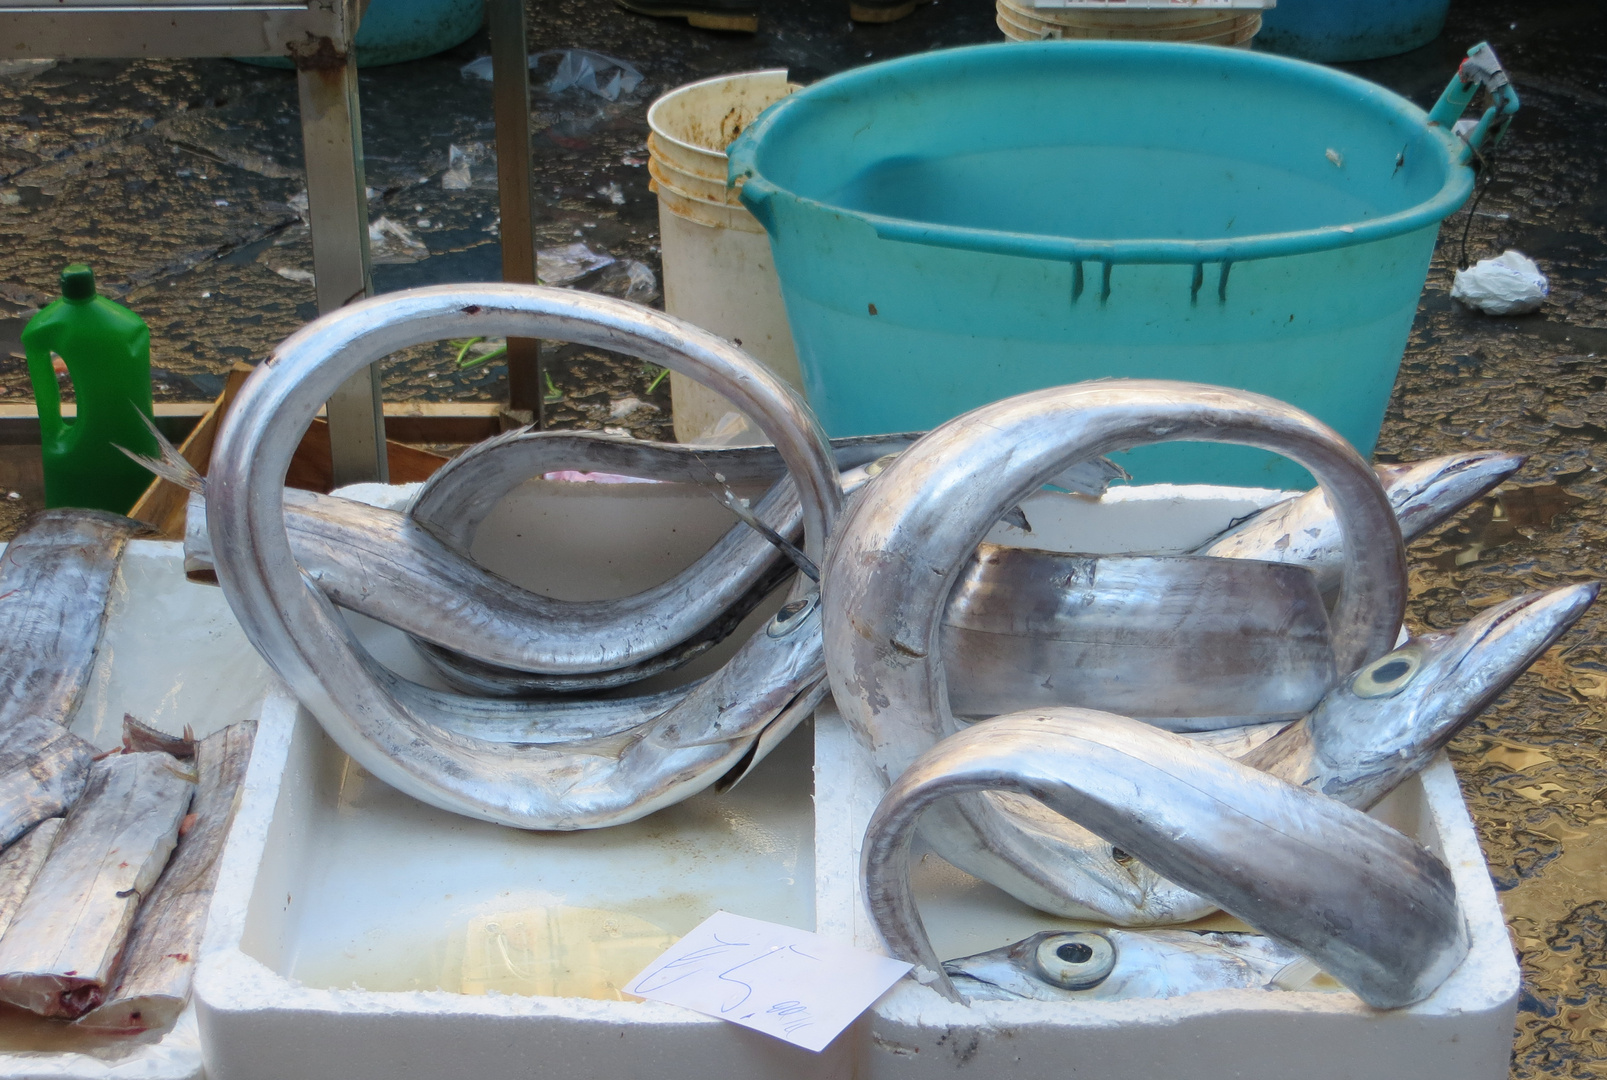 Fischmarkt La pescheria in Catania 1